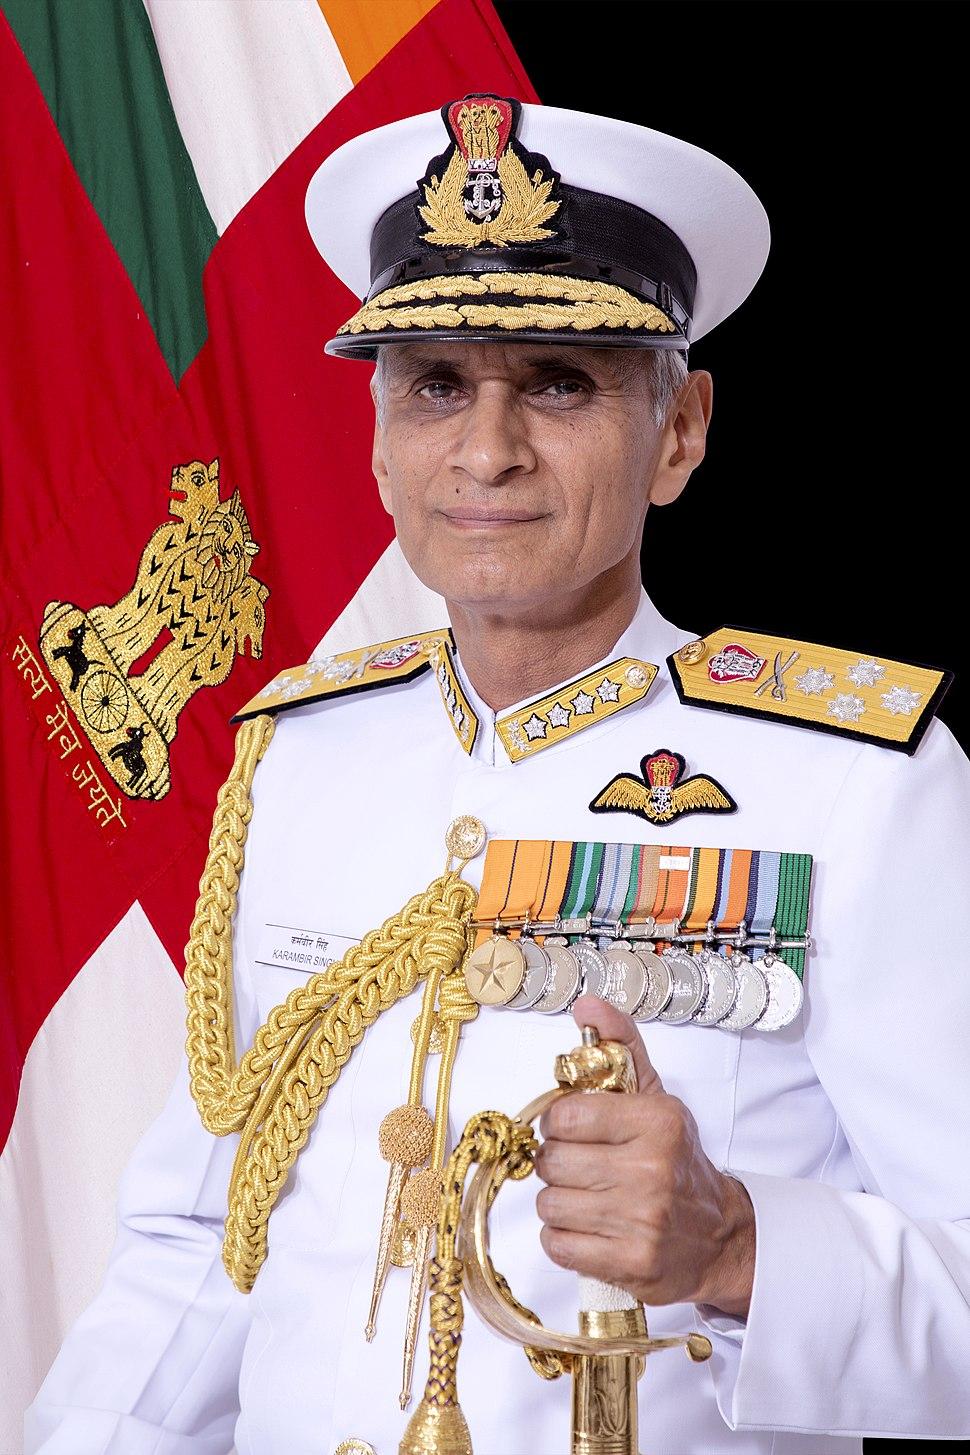 Admiral Karambir Singh, PVSM, AVSM, ADC